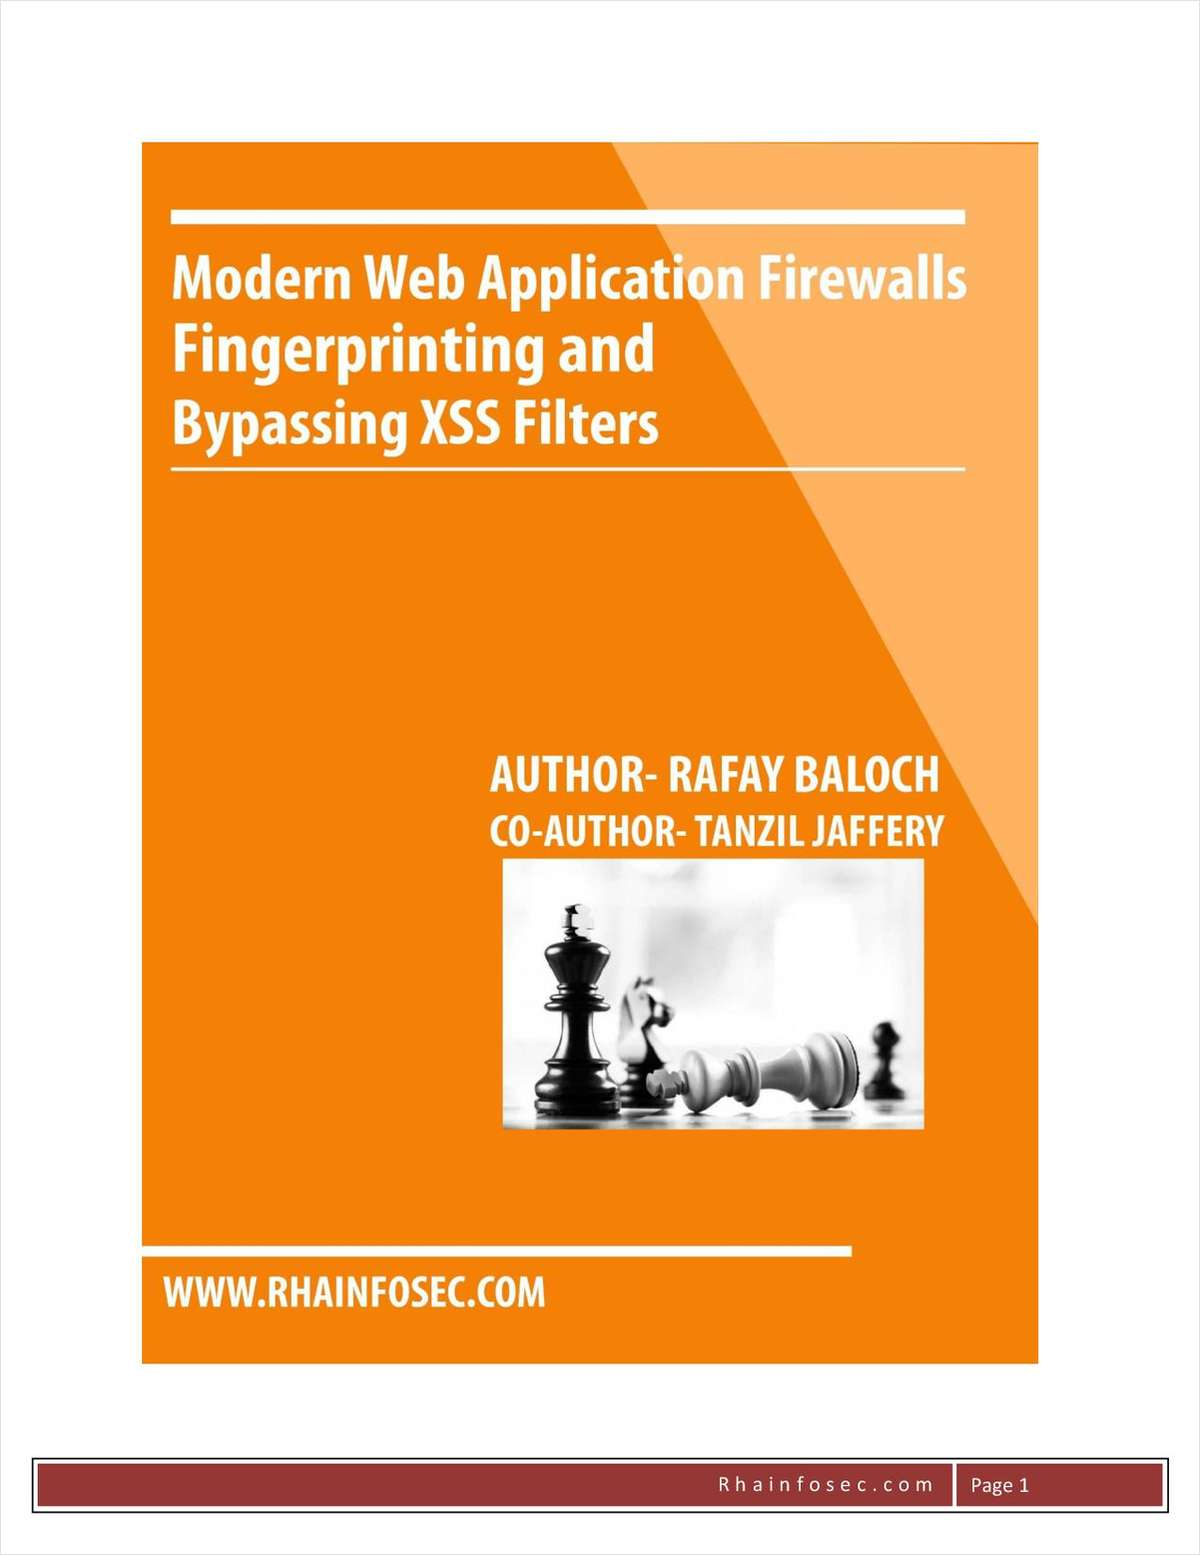 Modern Web Application Firewalls Fingerprinting and Bypassing XSS Filters